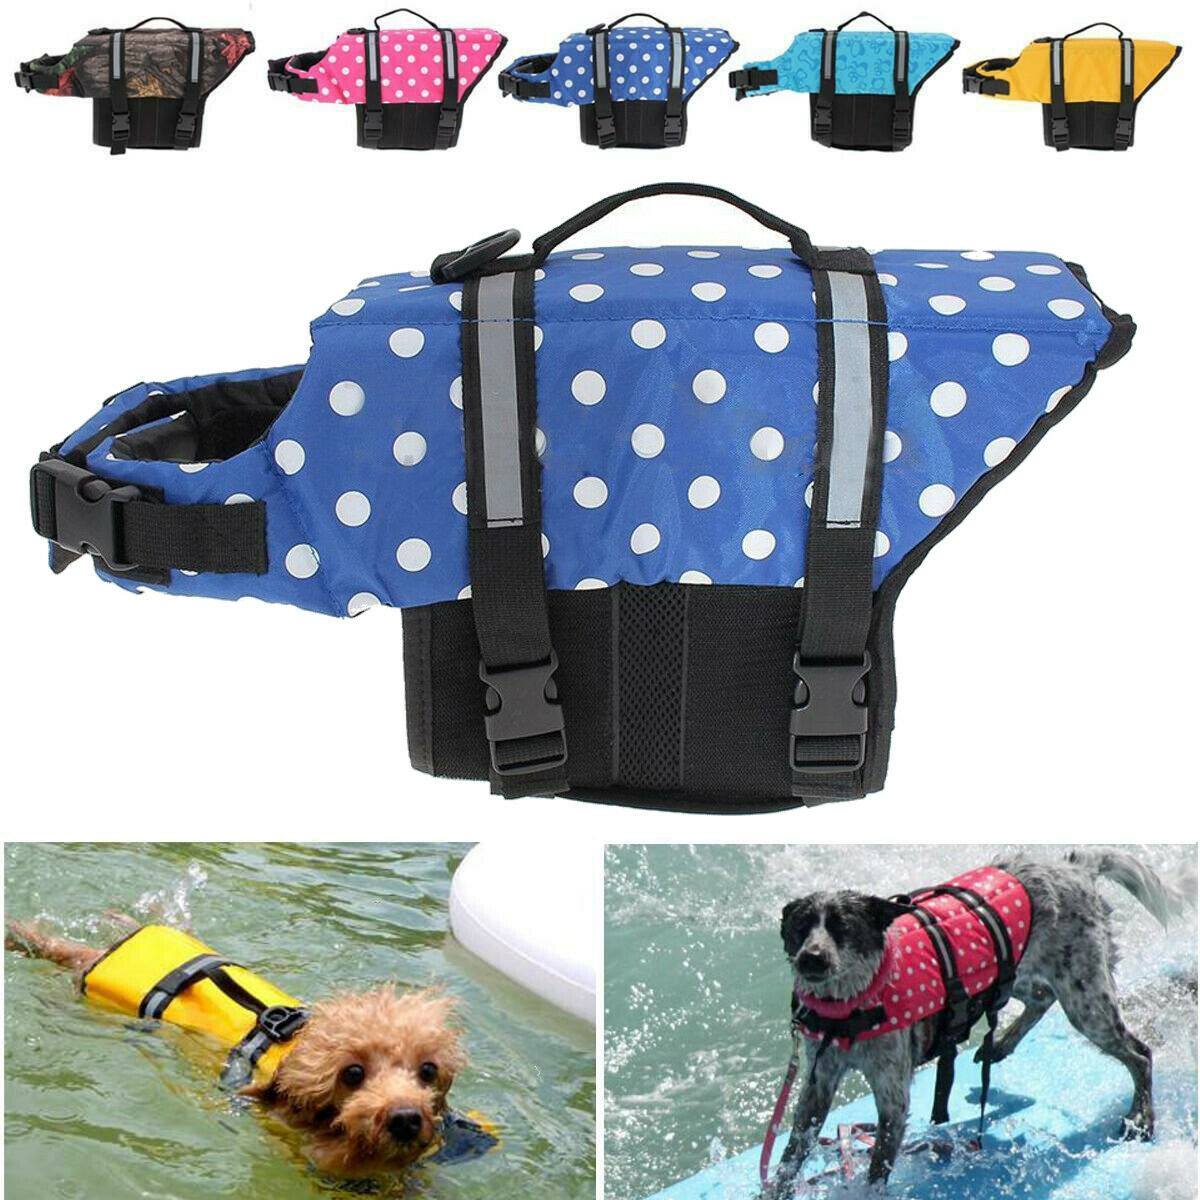 Vender mascotas perro gato protector chaleco salvavidas chaleco reflectante salvavidas acuáticos vela